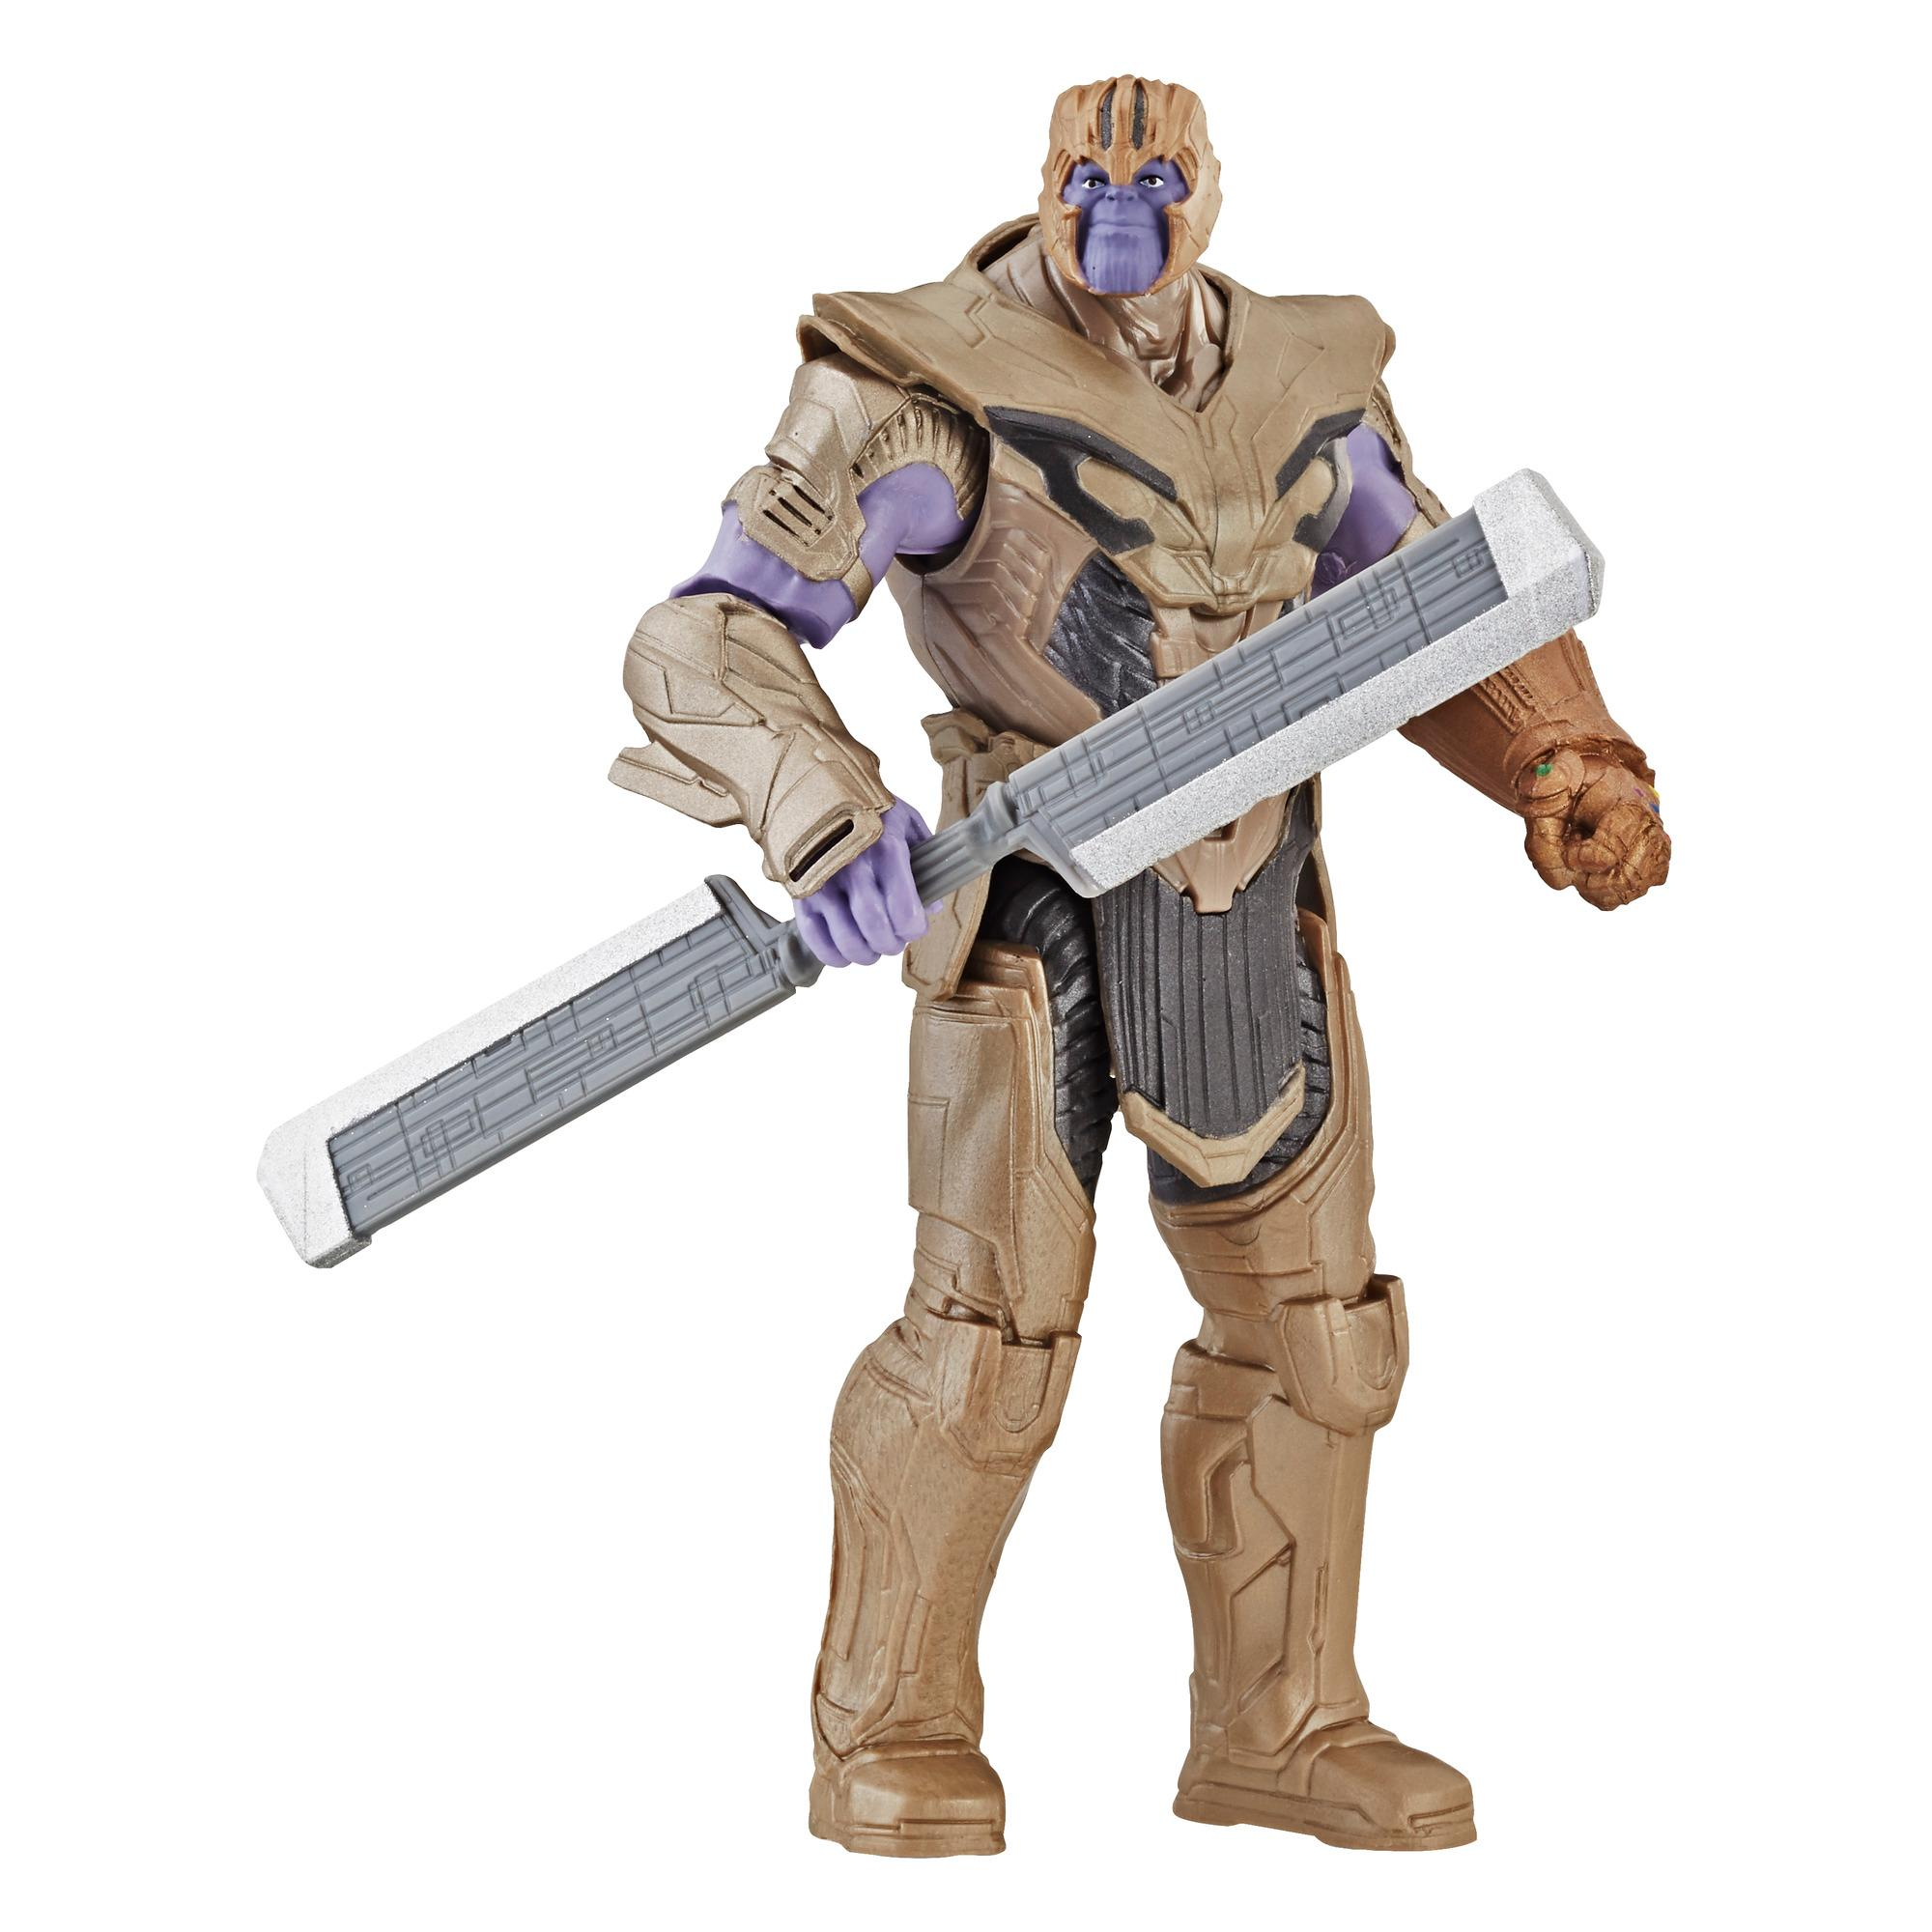 Marvel Avengers: Endgame Figura de Thanos como se ve en el Universo Cinematográfico de Marvel